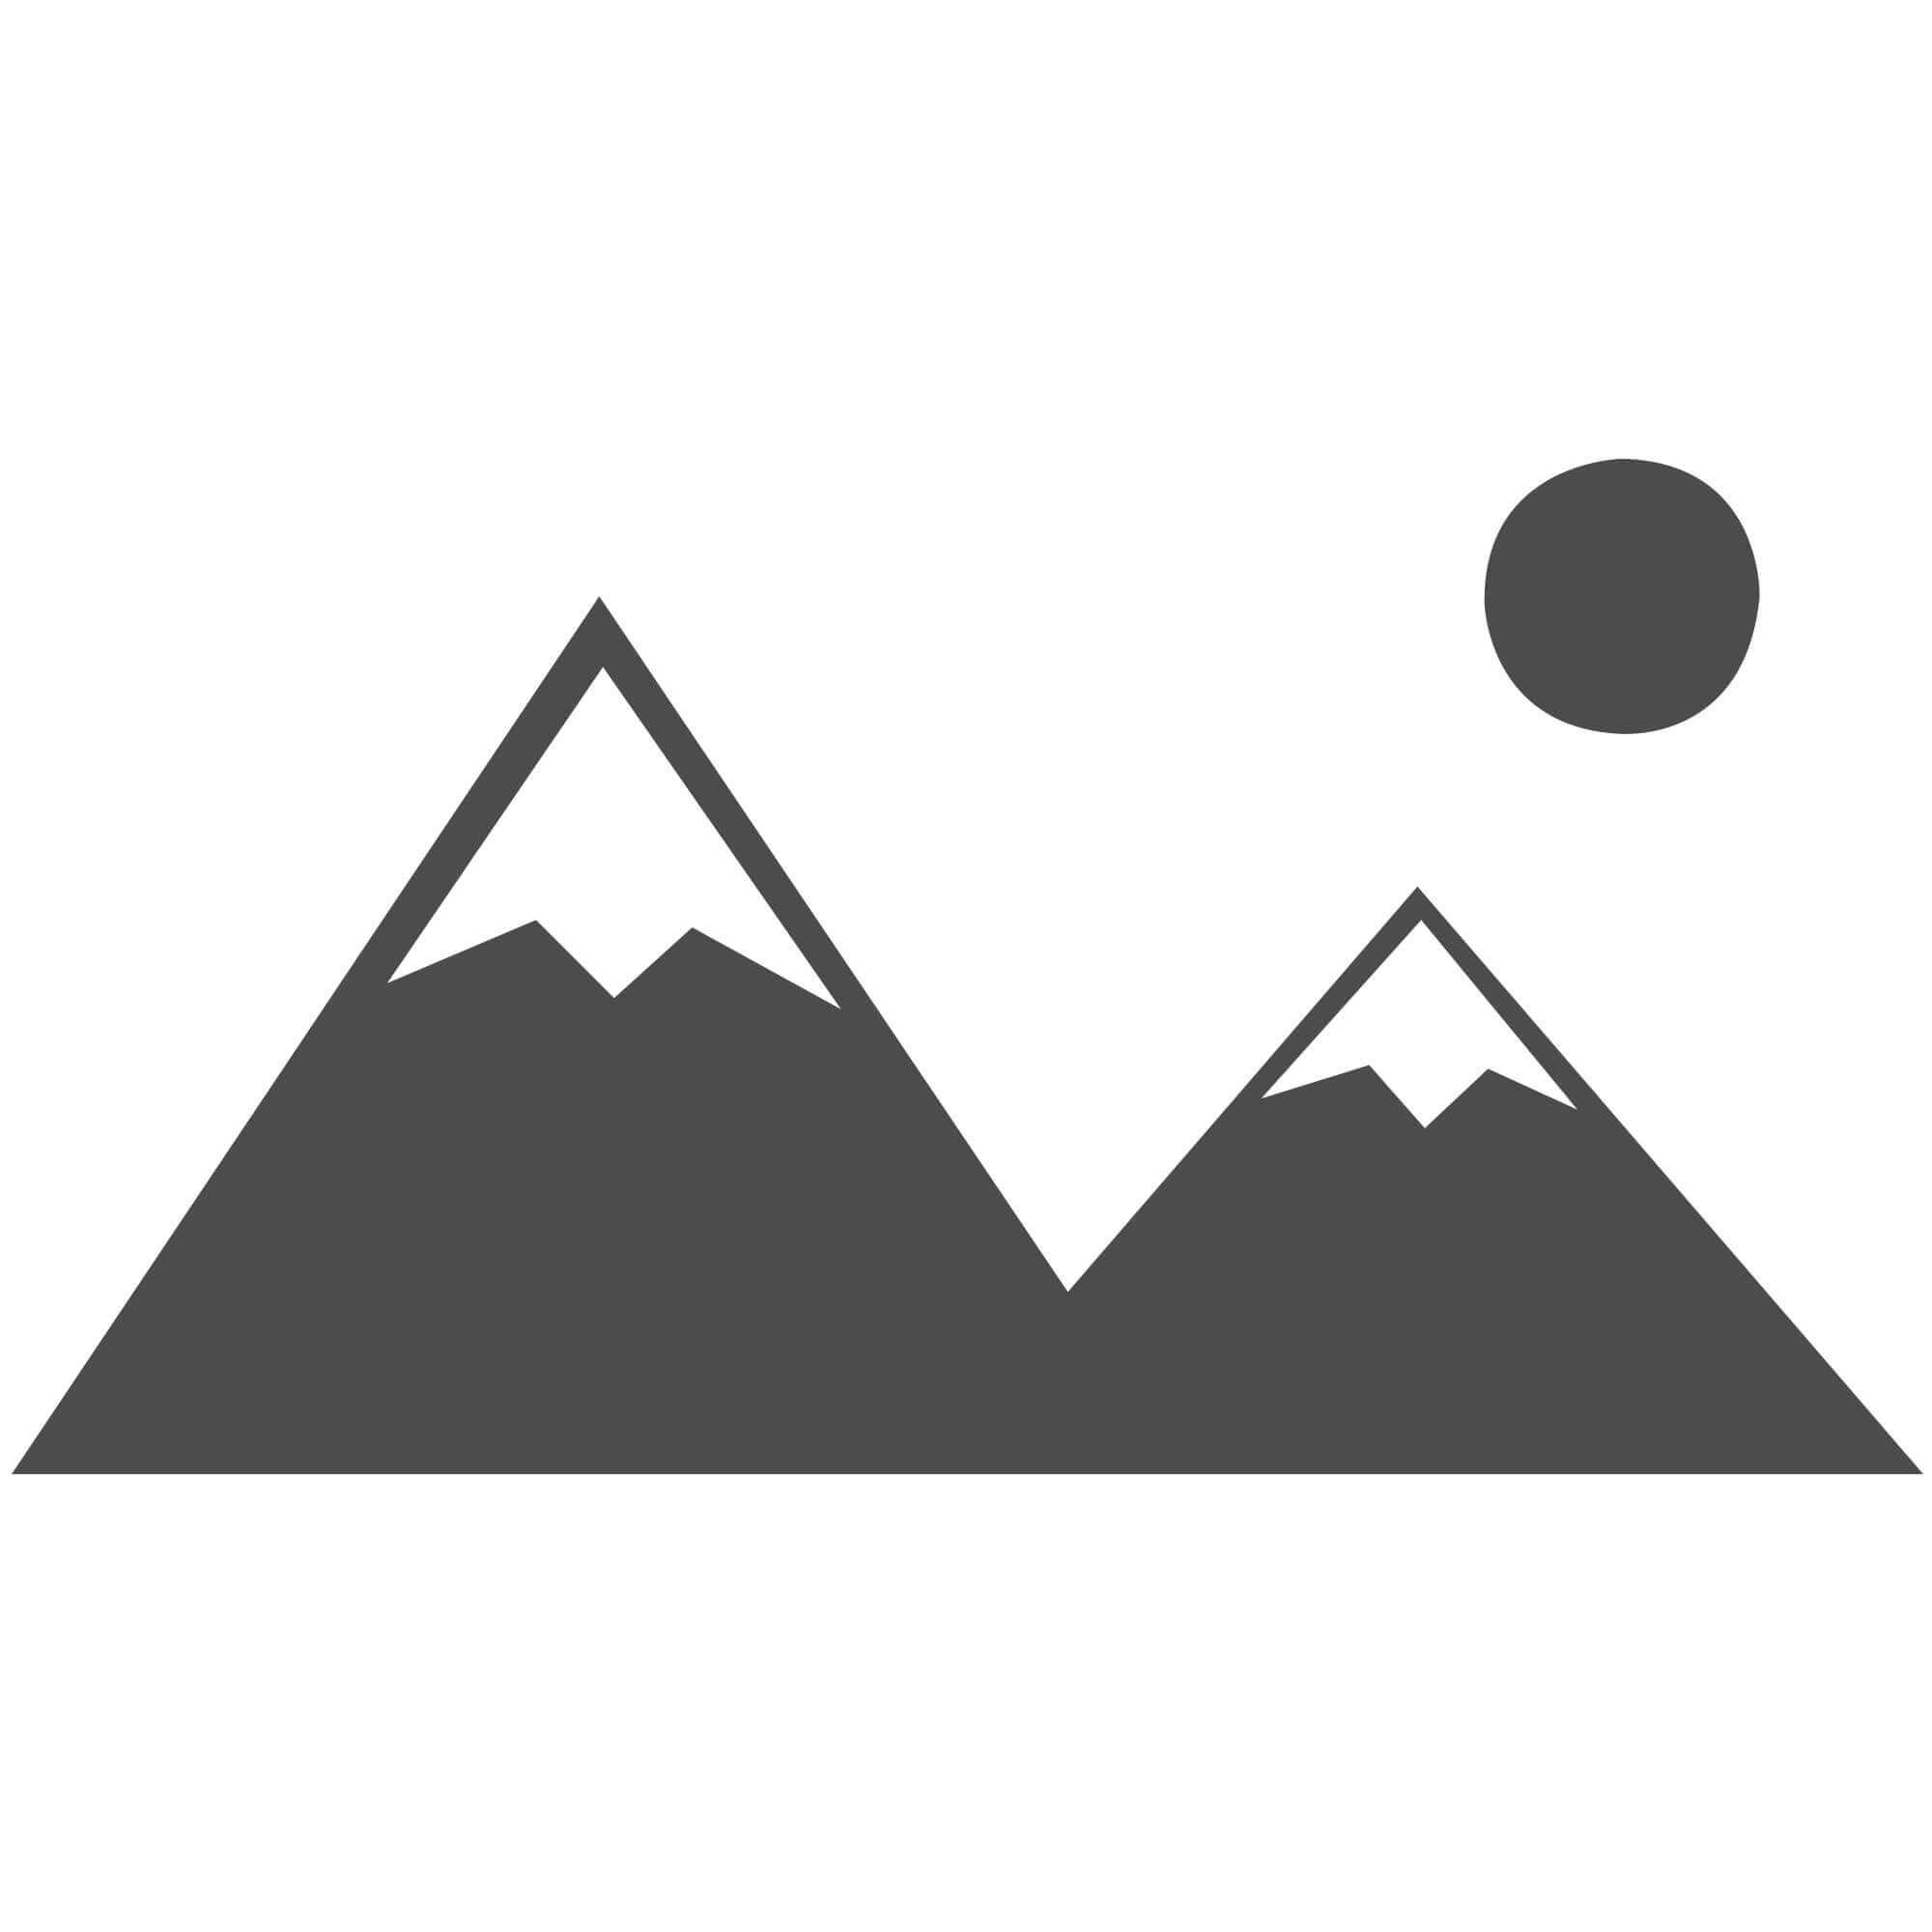 Gatsby Floral Rug - GAT01 Black